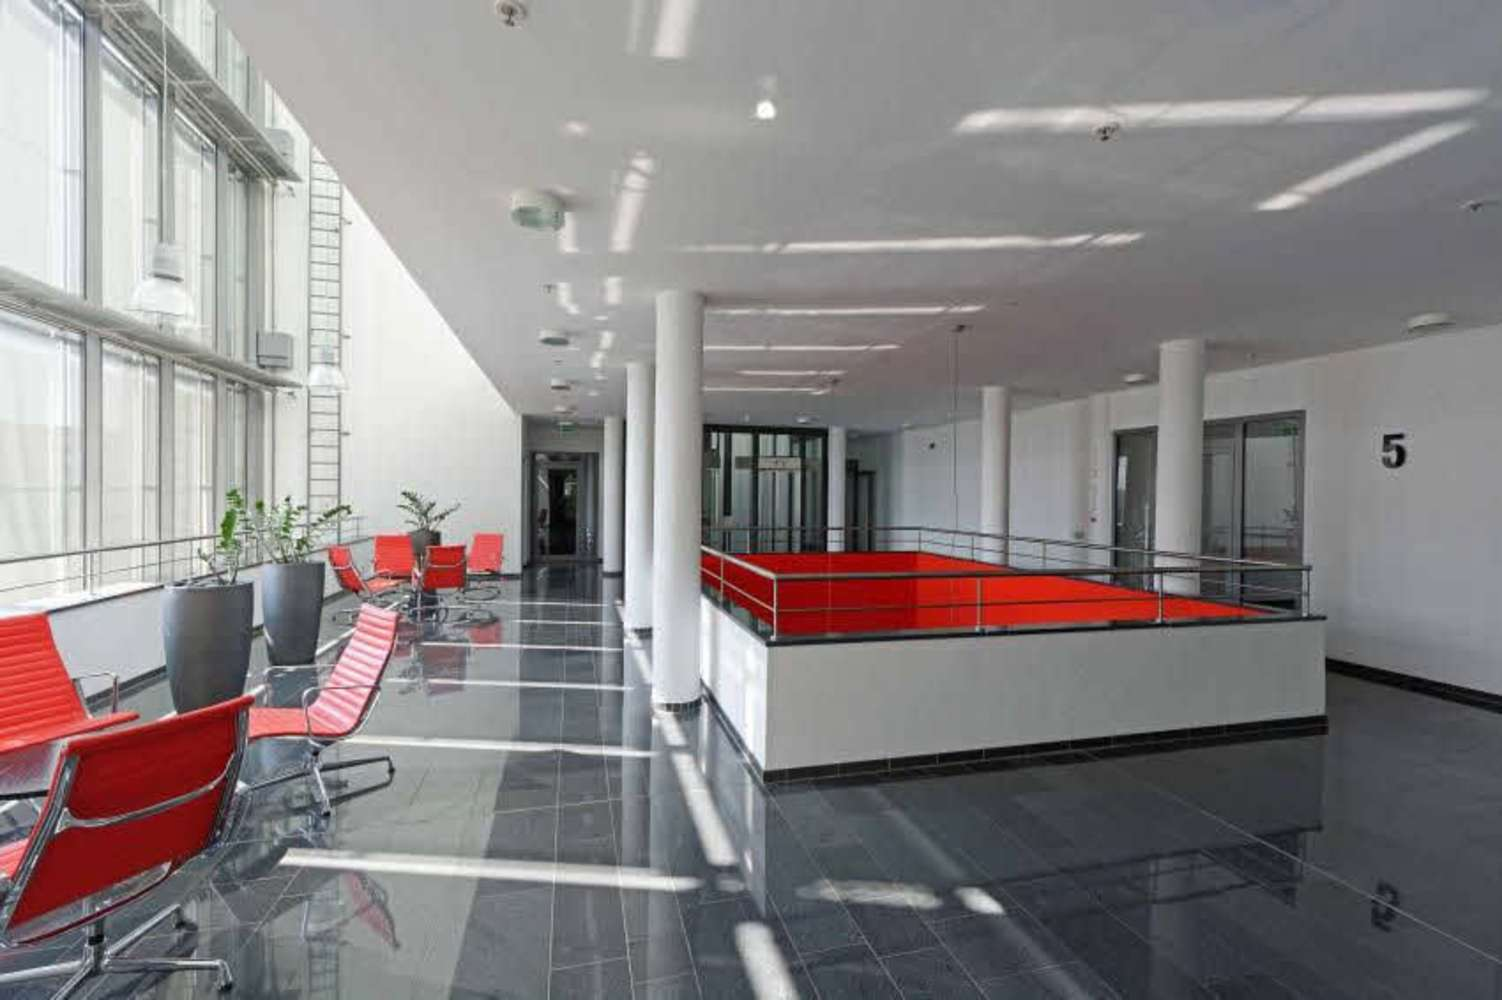 Büros Frankfurt am main, 60598 - Büro - Frankfurt am Main, Sachsenhausen - F1445 - 9417143